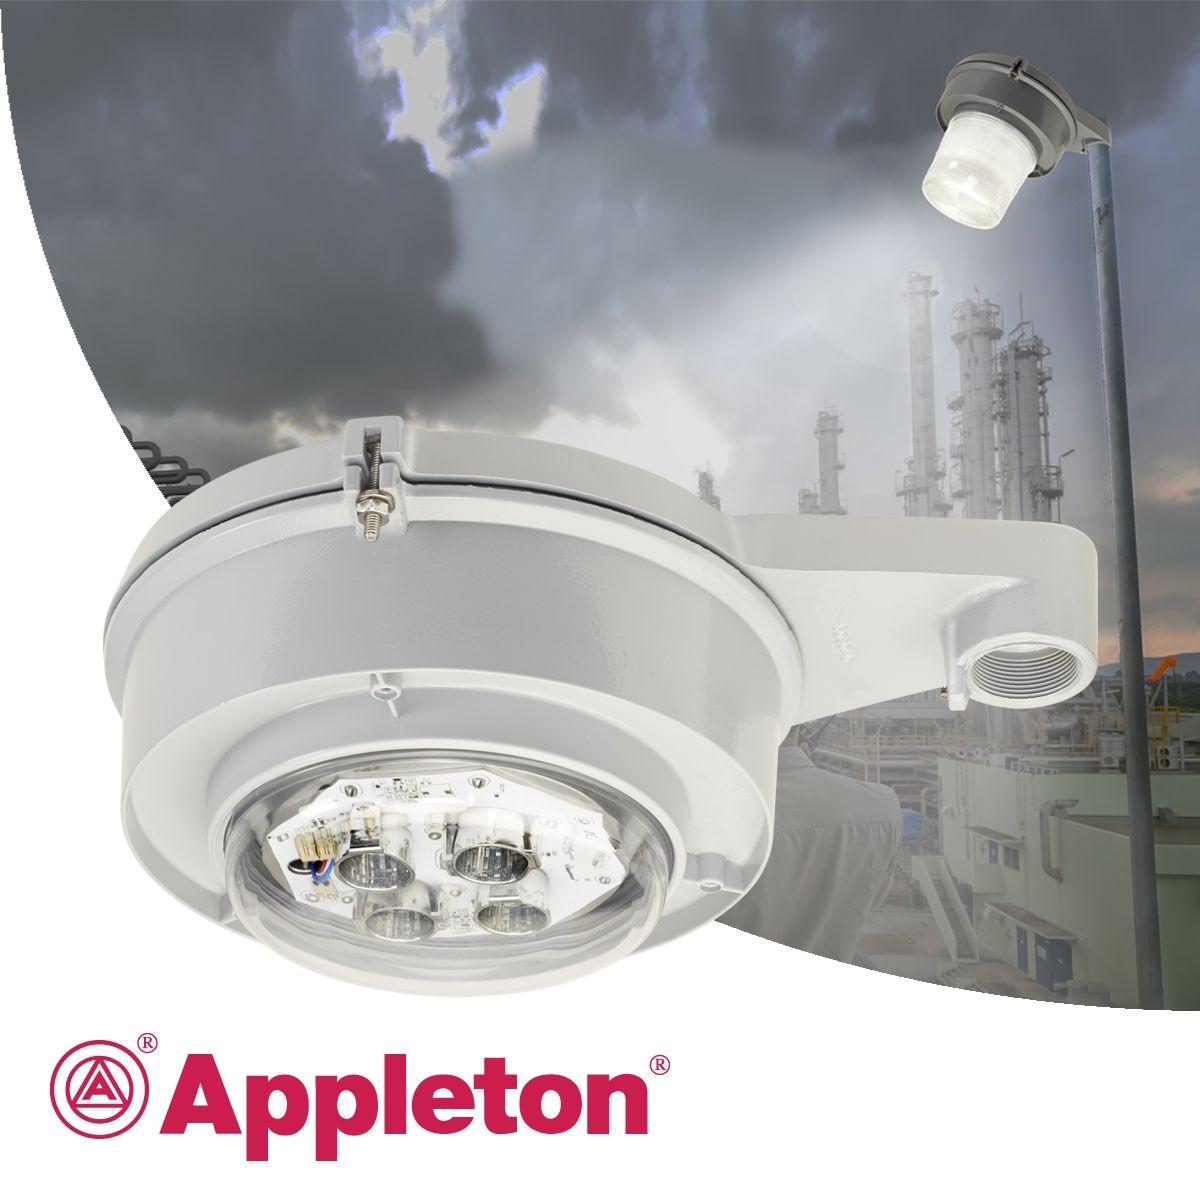 Appleton led light fixtures httpdeai rankfo pinterest appleton led light fixtures arubaitofo Gallery